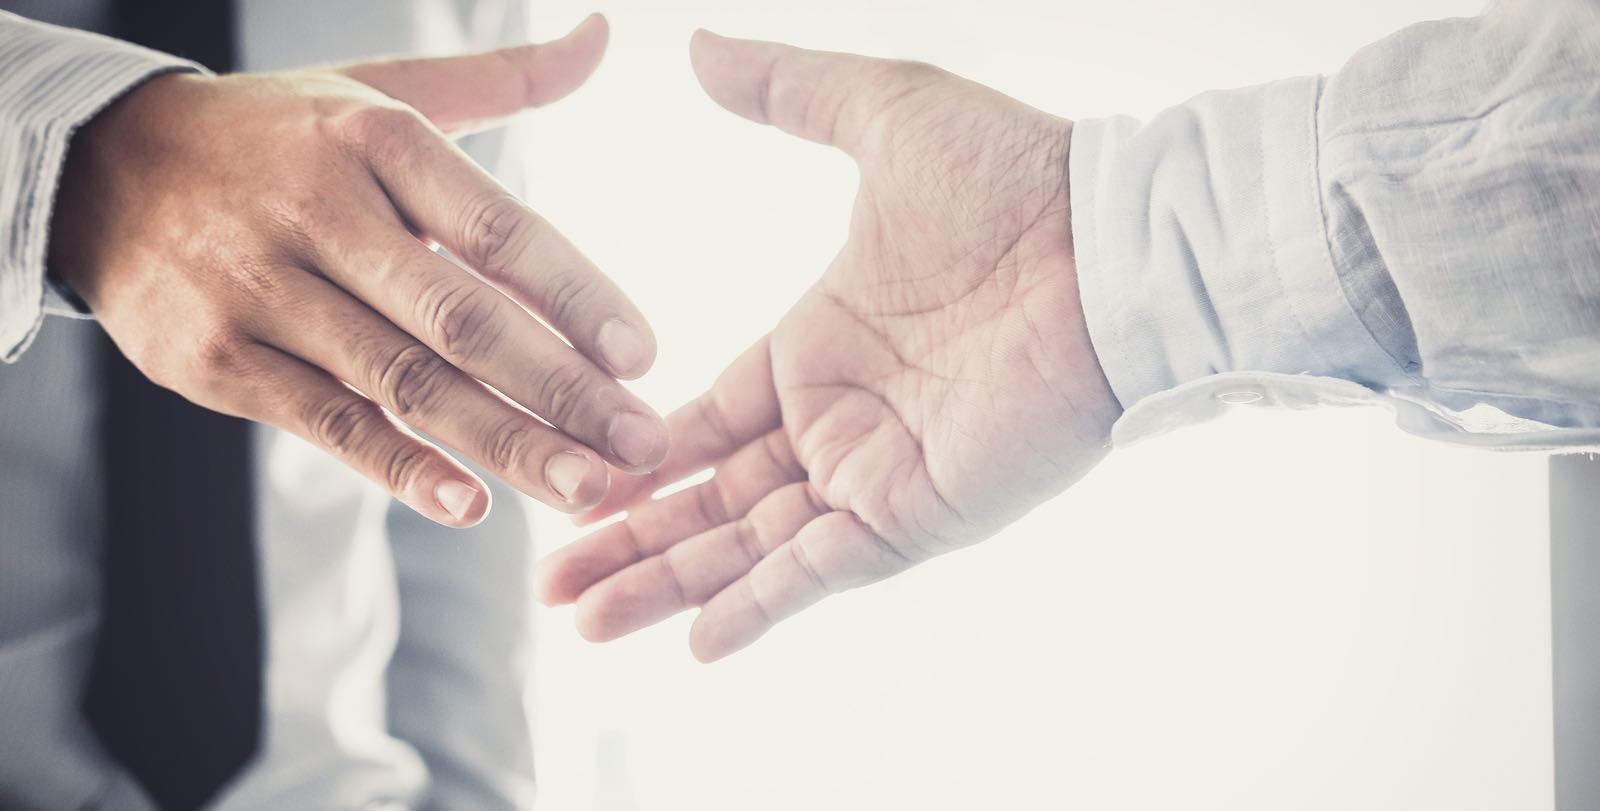 Domestic Assault Legal Help